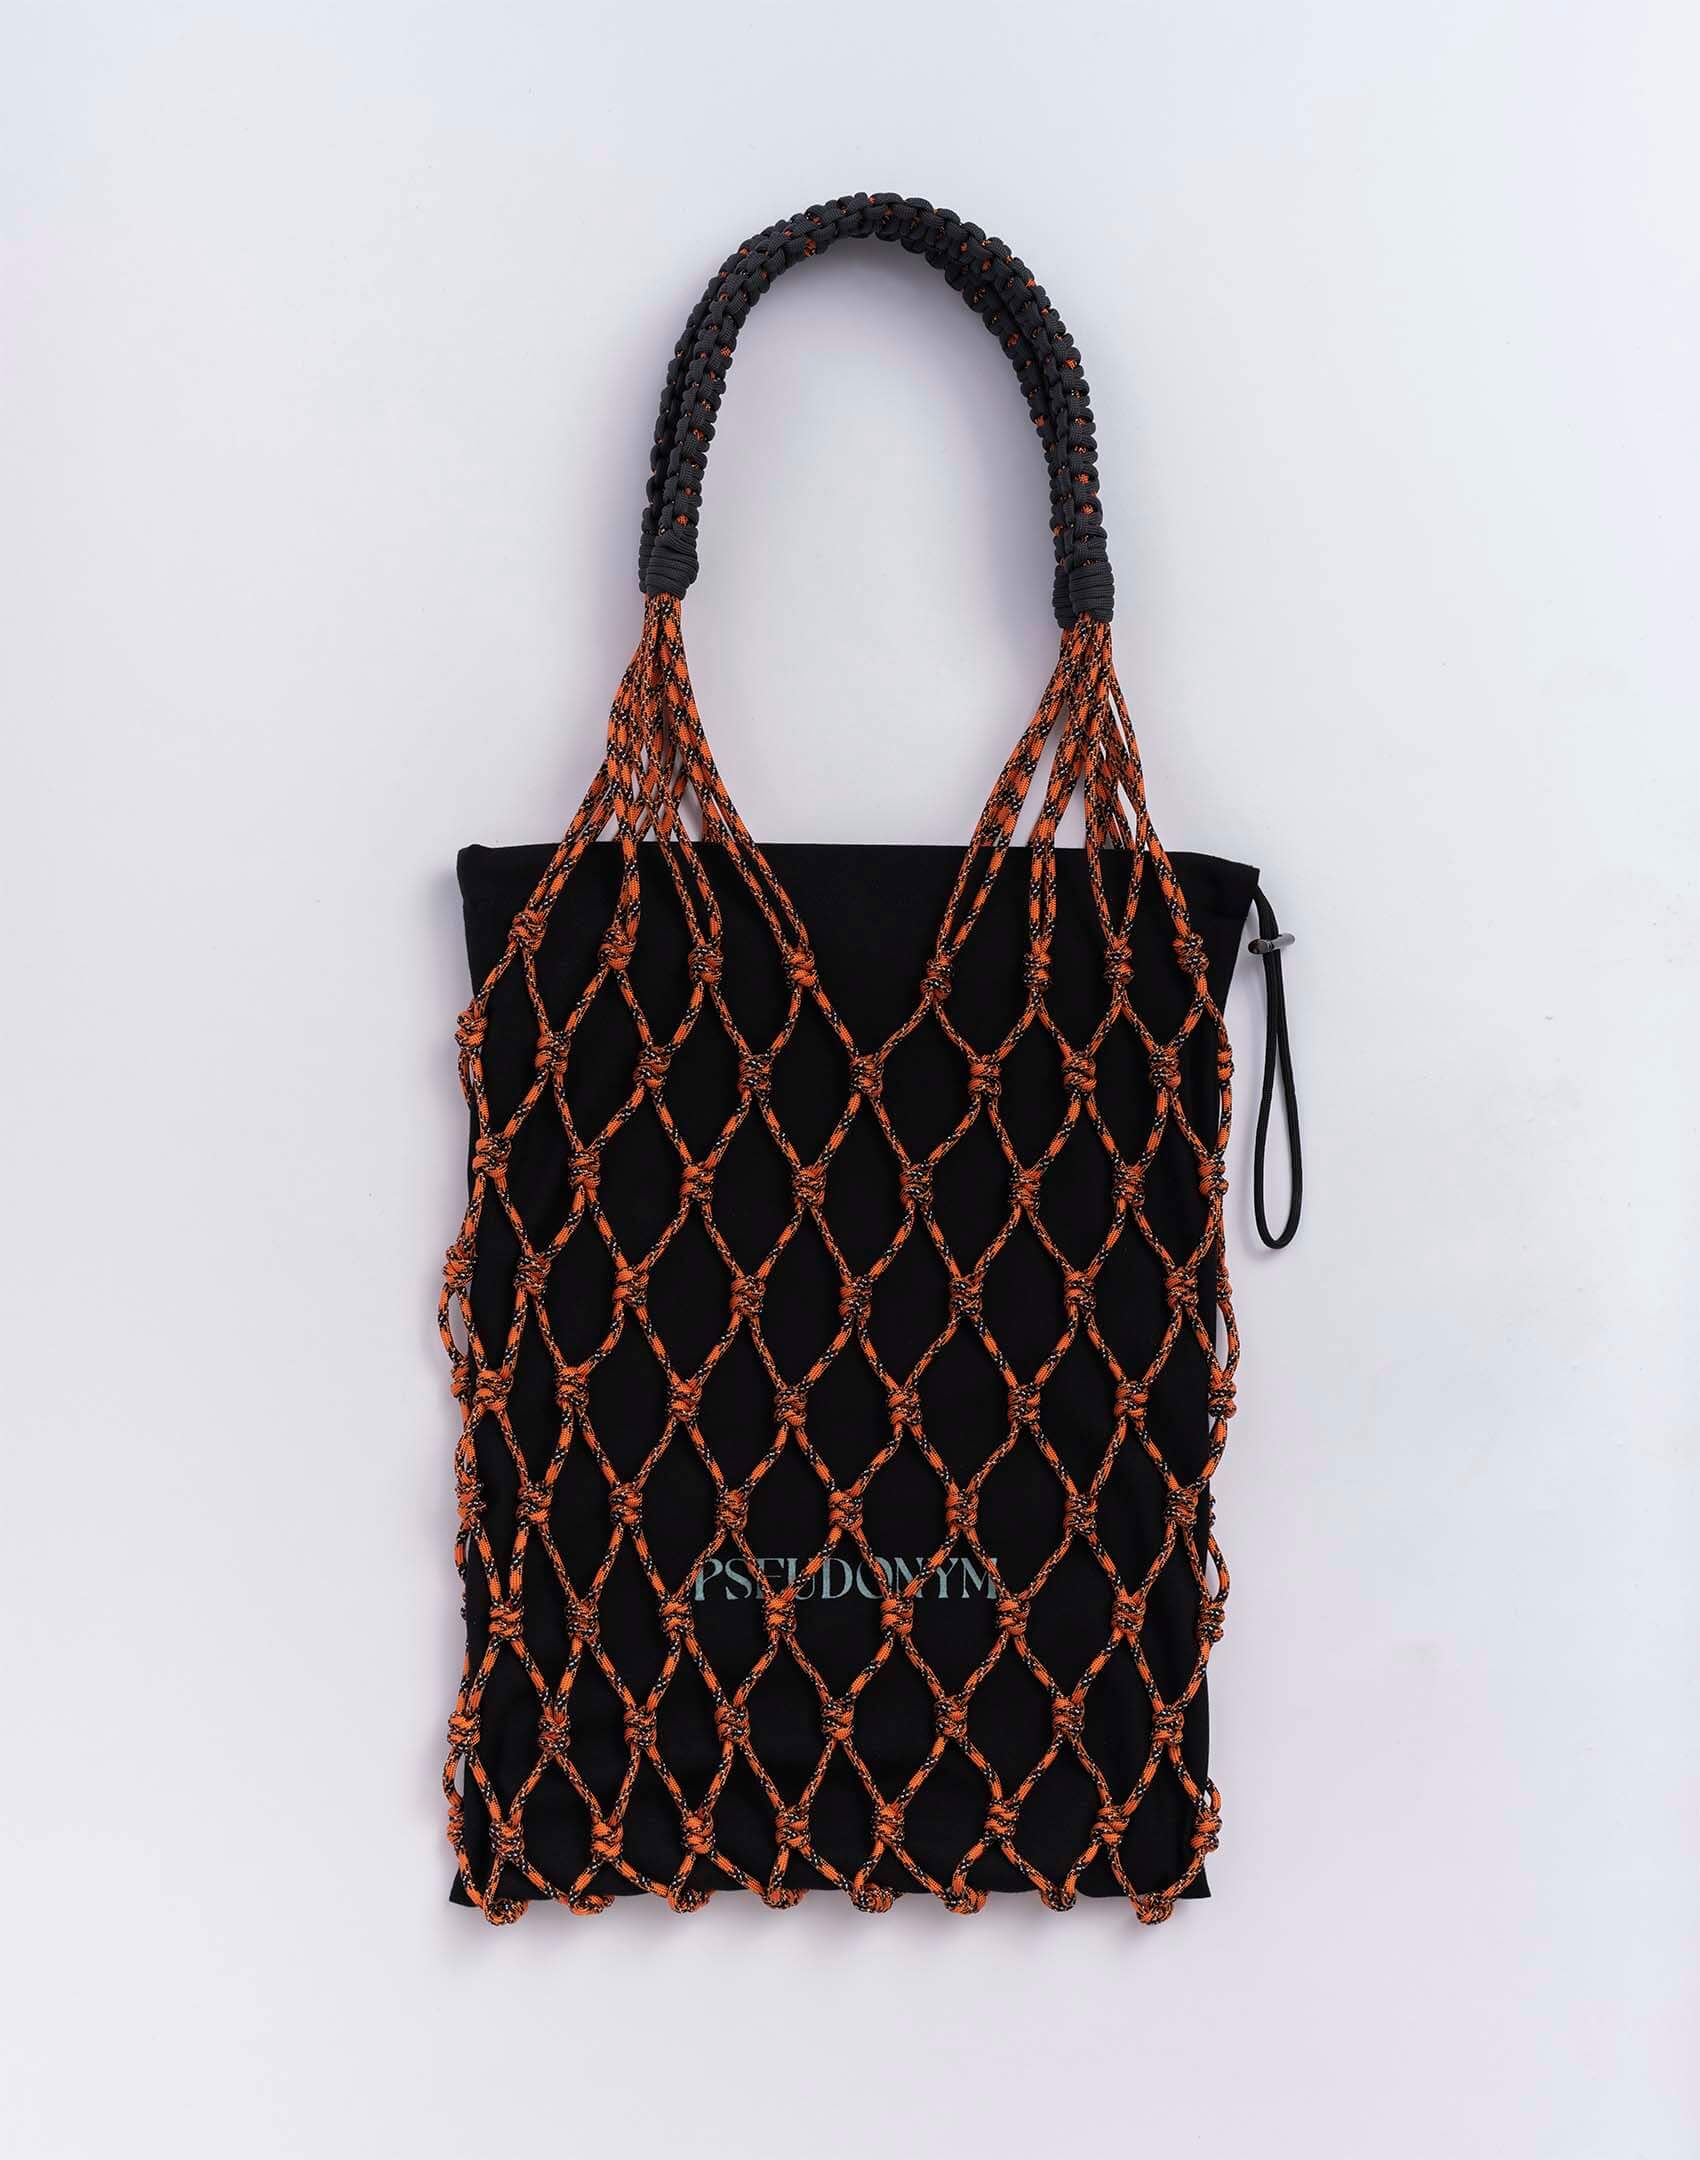 P.S. Field Bag 09 (Candy Corn), orange/black/white colorway.